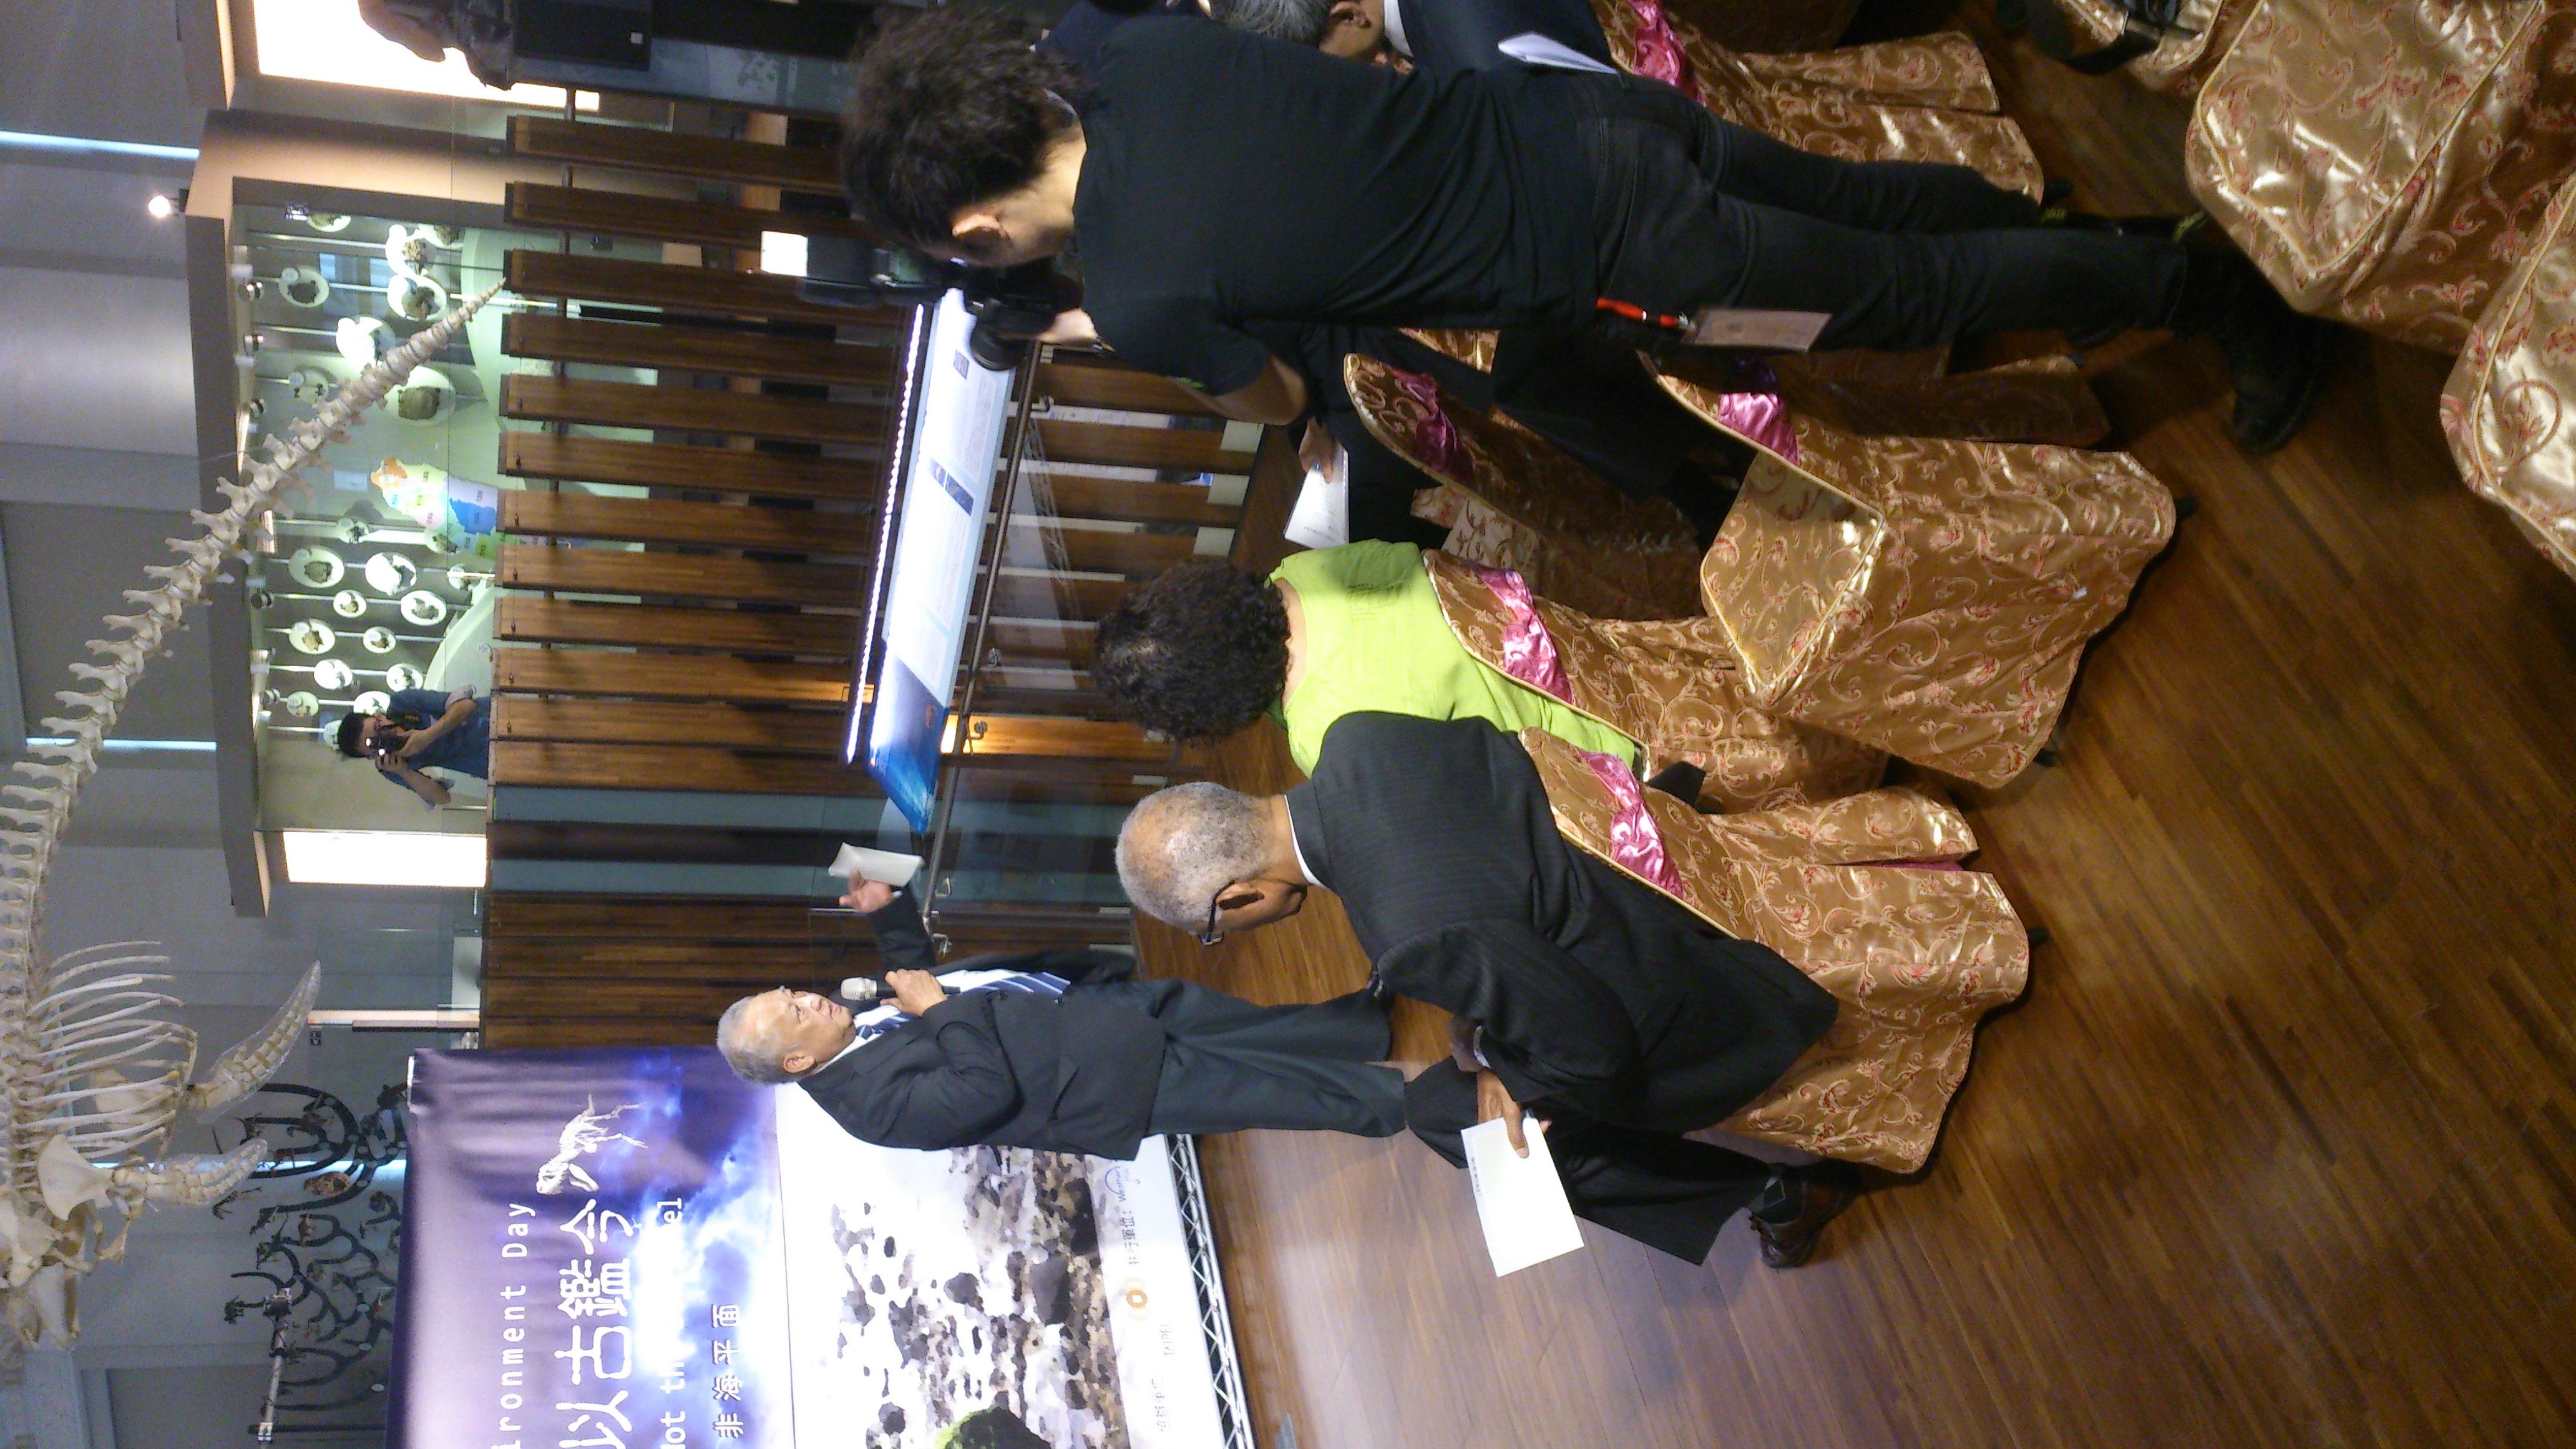 Ambassador Phillip K. Kabua from the Republic of the Marshall Islands/馬紹爾群島共和國大使菲利浦.卡布亞